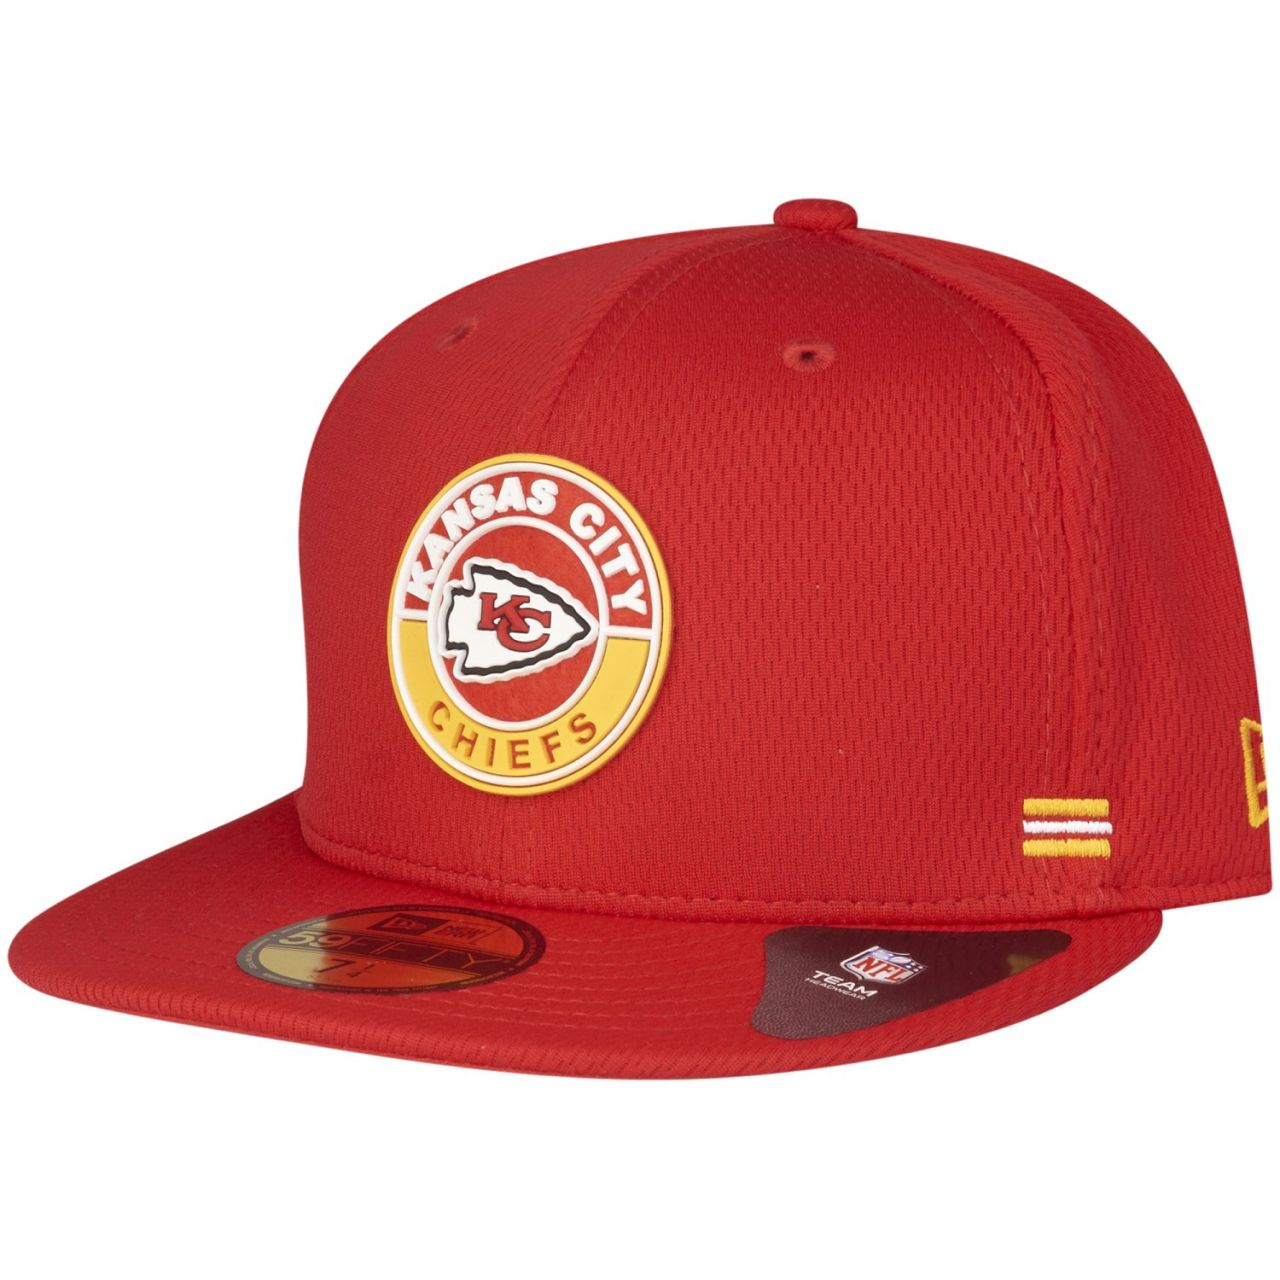 amfoo - New Era 59Fifty Fitted Cap - ROAD Kansas City Chiefs